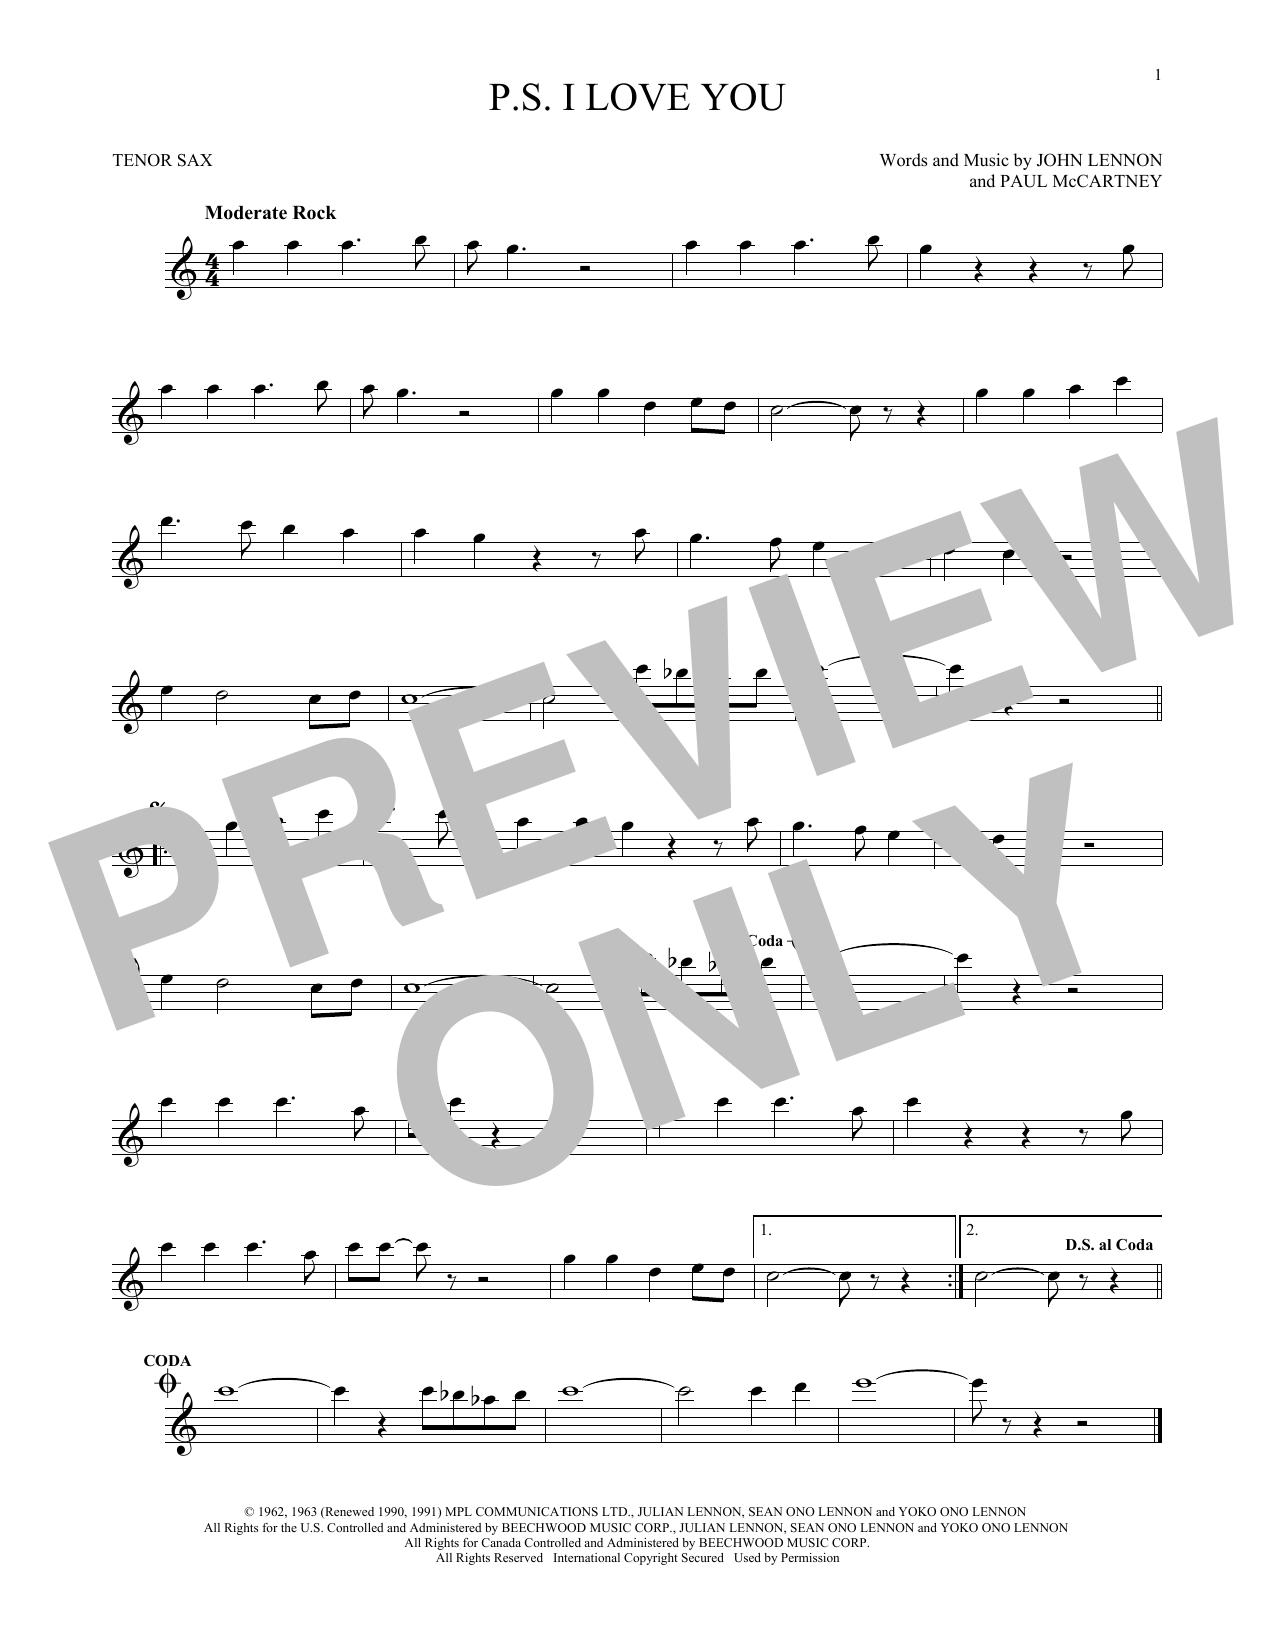 P.S. I Love You Sheet Music